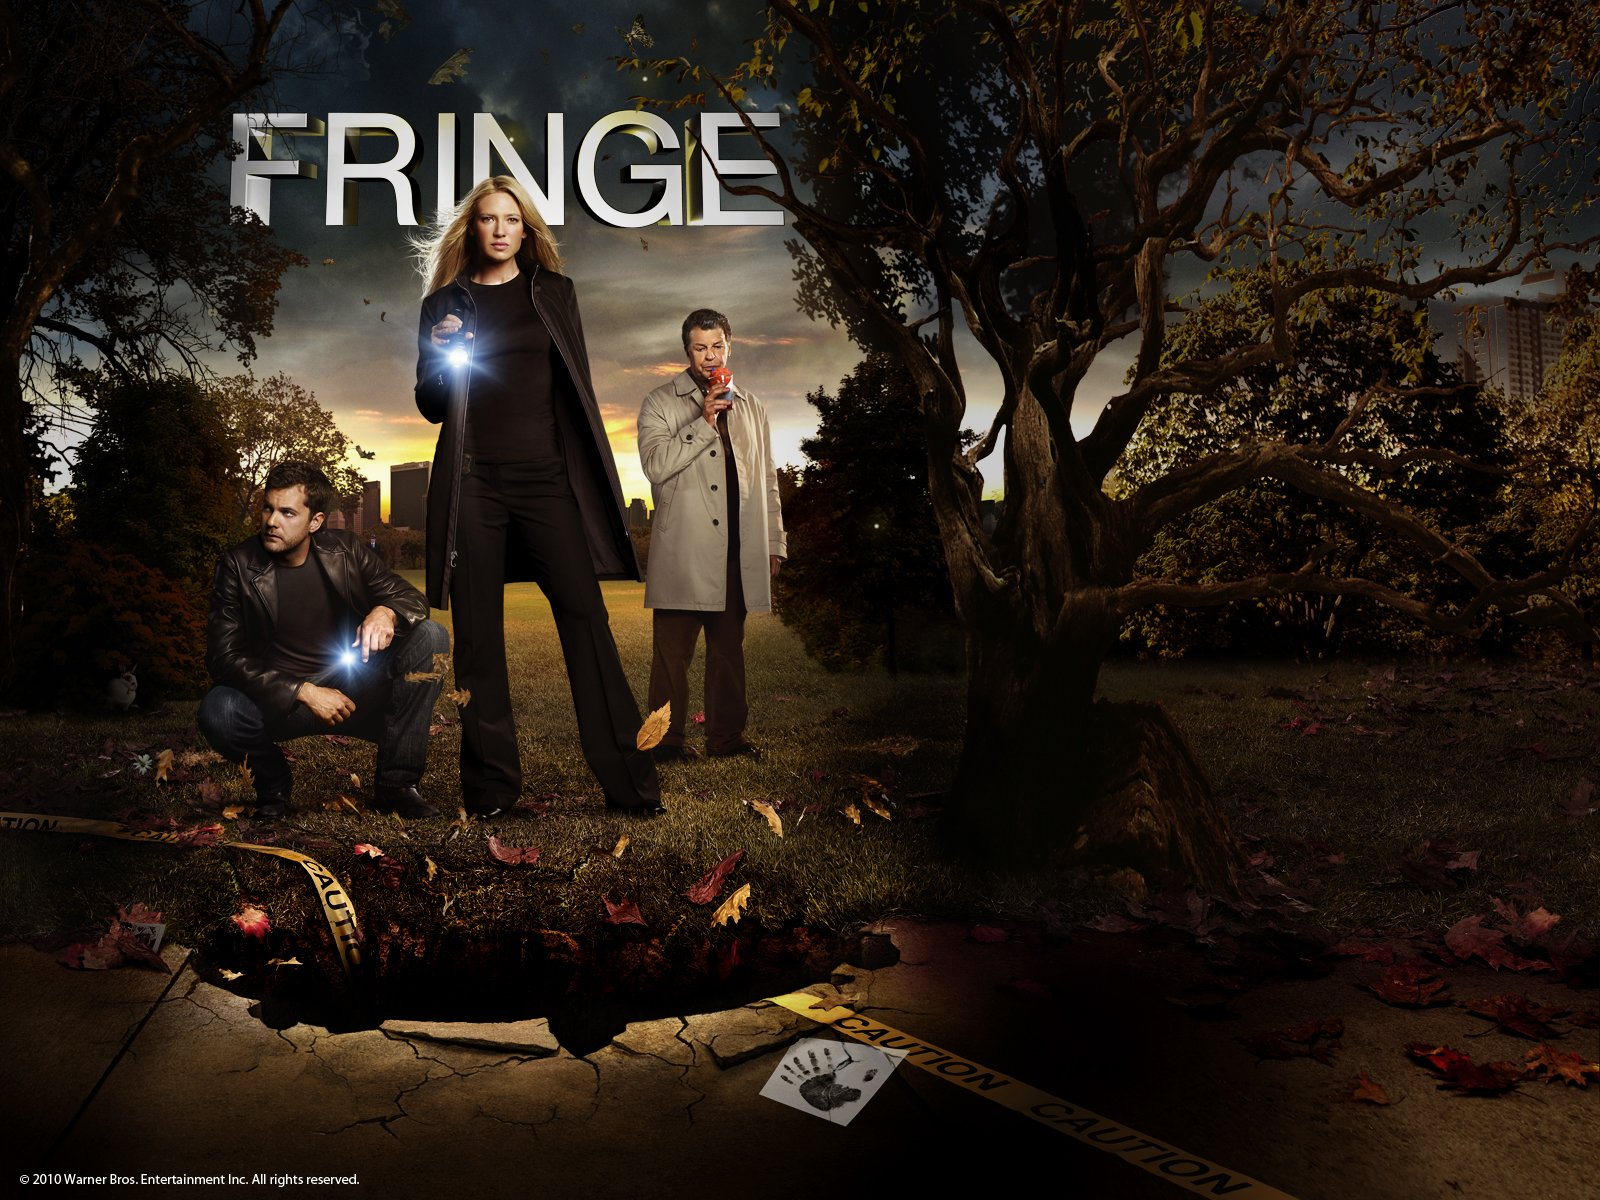 Amazon.com: Watch Fringe: The Complete Third Season | Prime Video